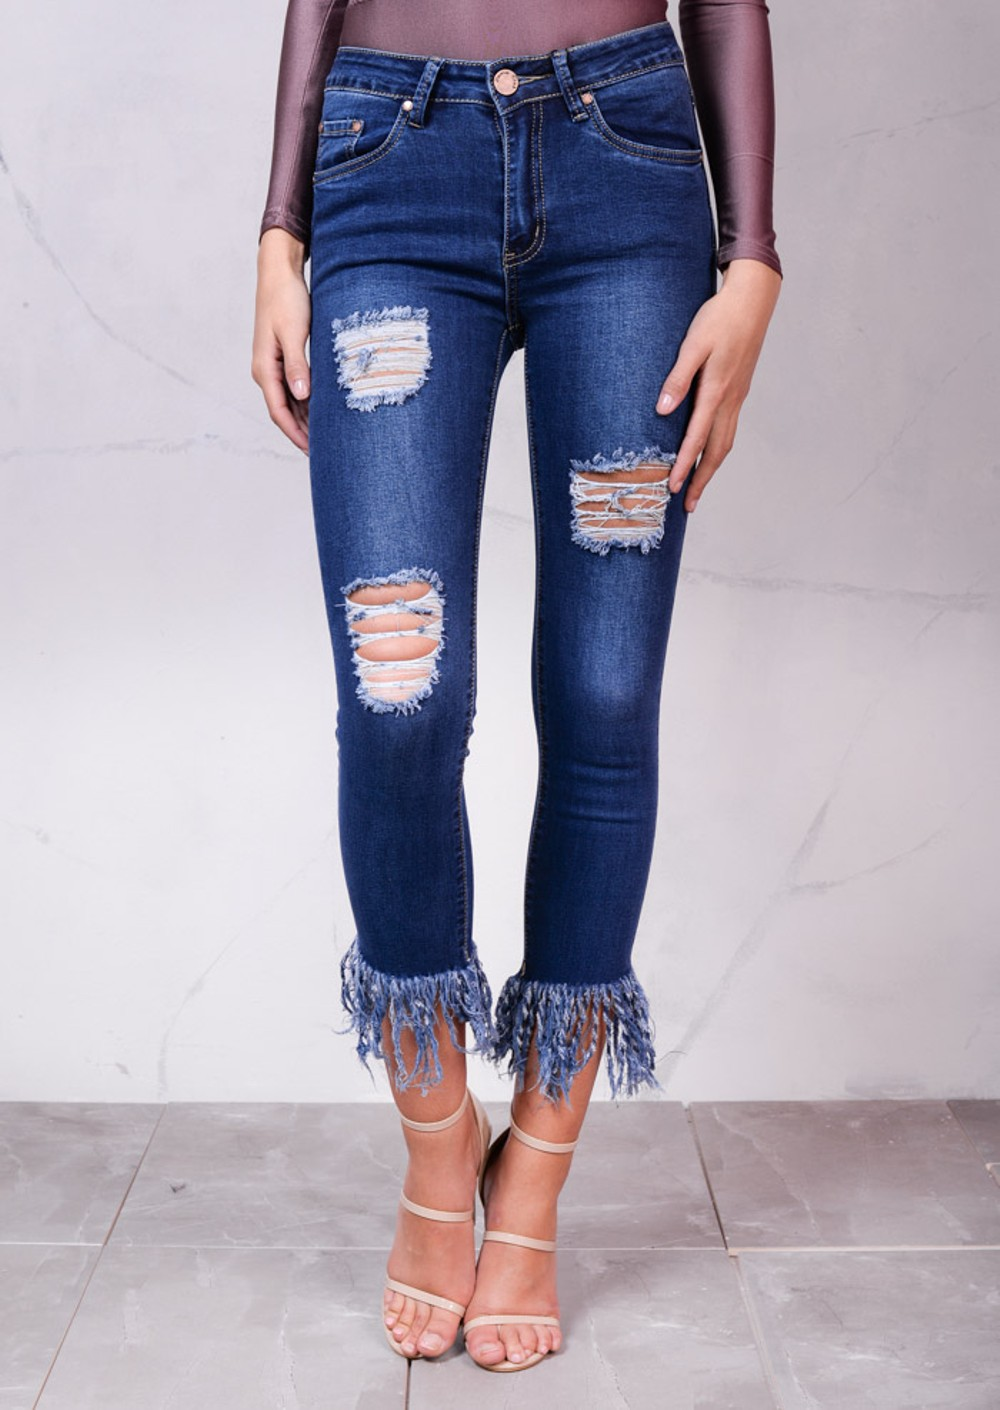 Size 12 fashion blogger 86